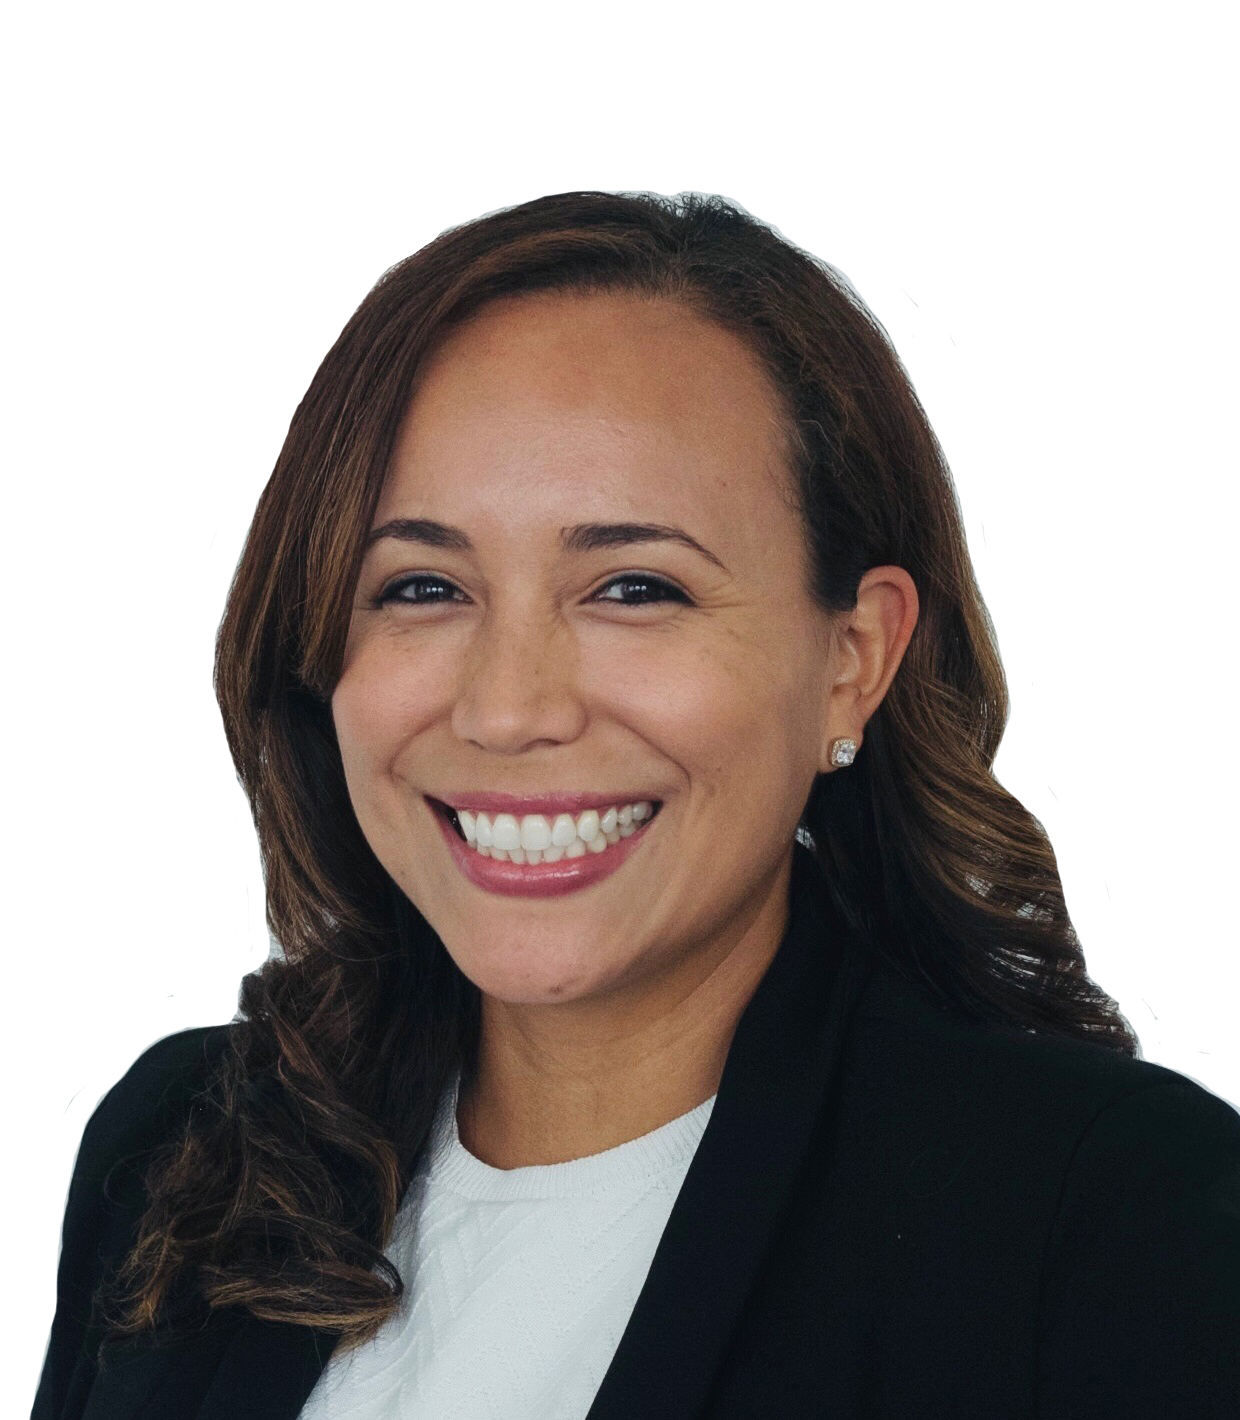 Vanessa Grijalba, OTD, OTR/L, CHT